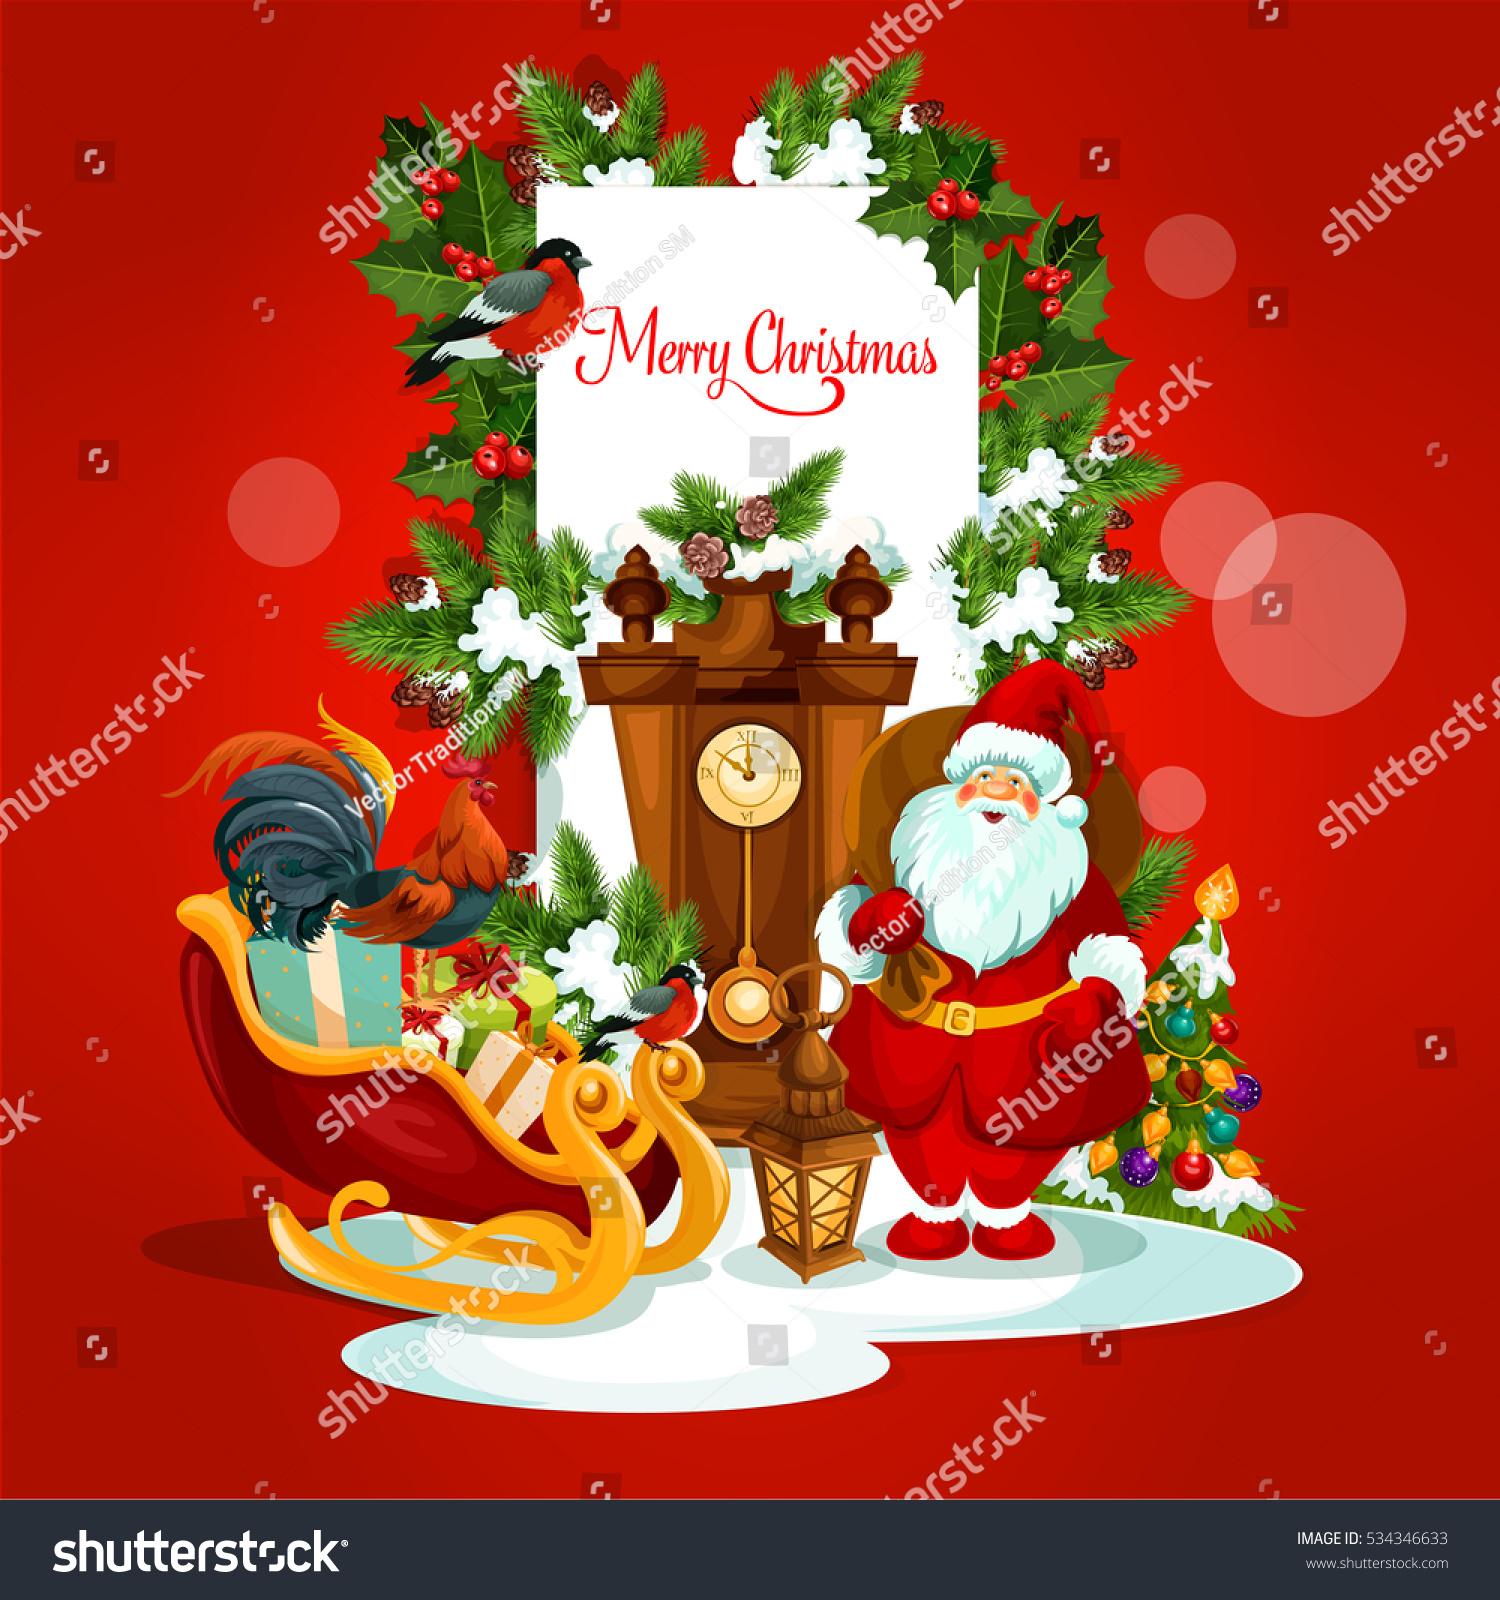 Merry Christmas Card Santa Claus Gift Stock Illustration 534346633 ...